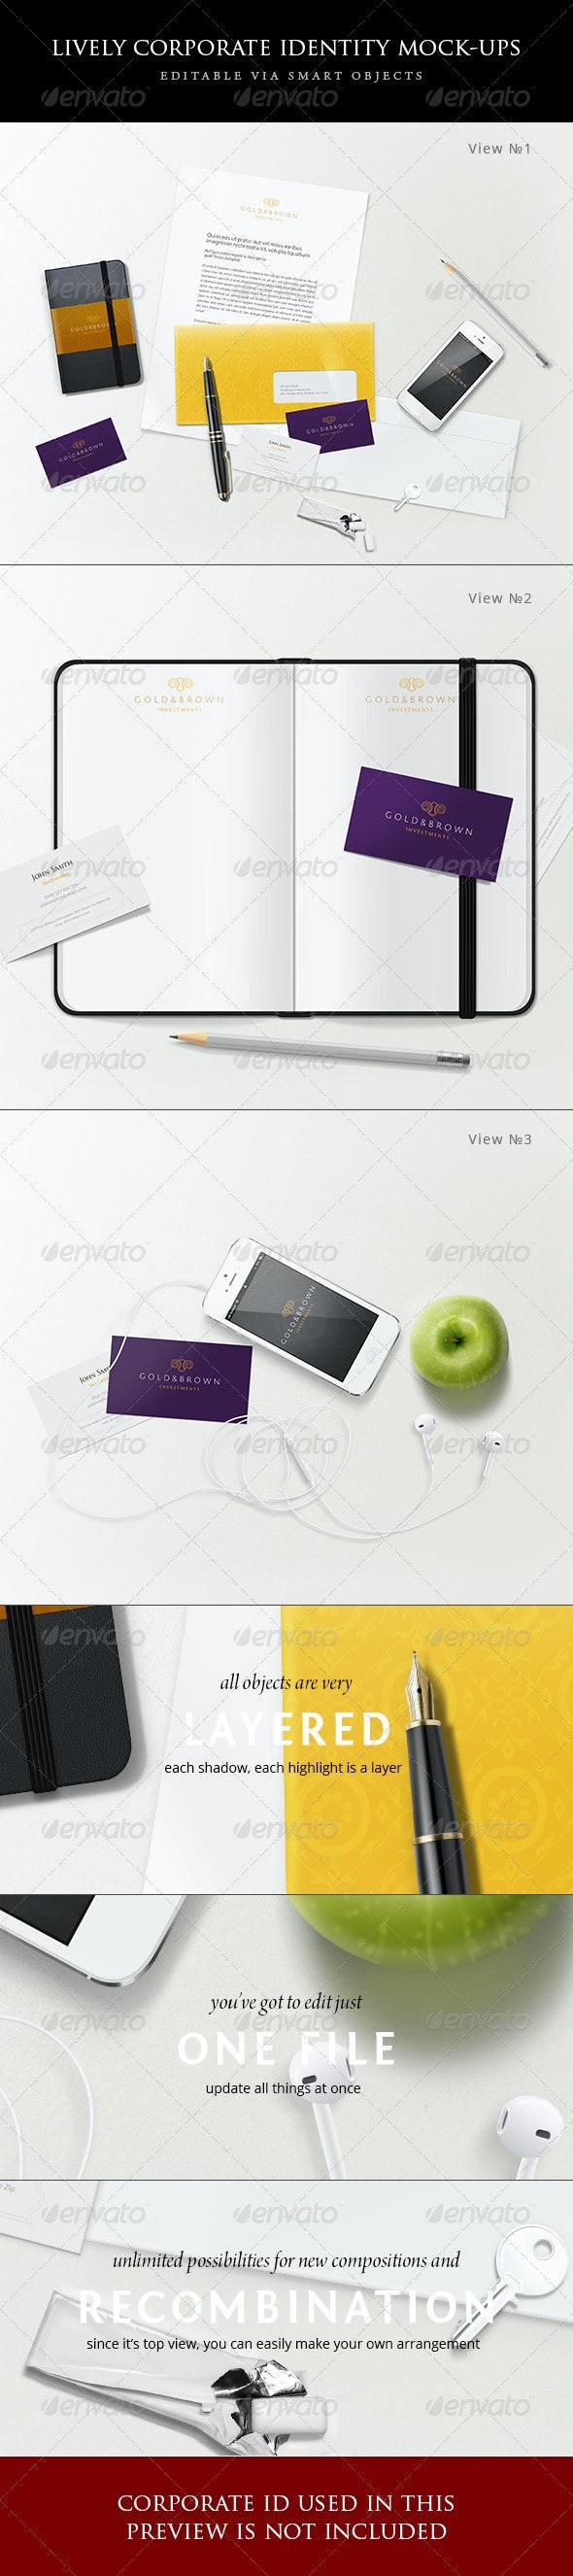 Lively corporate stationery/branding mock-ups  - Stationery Print